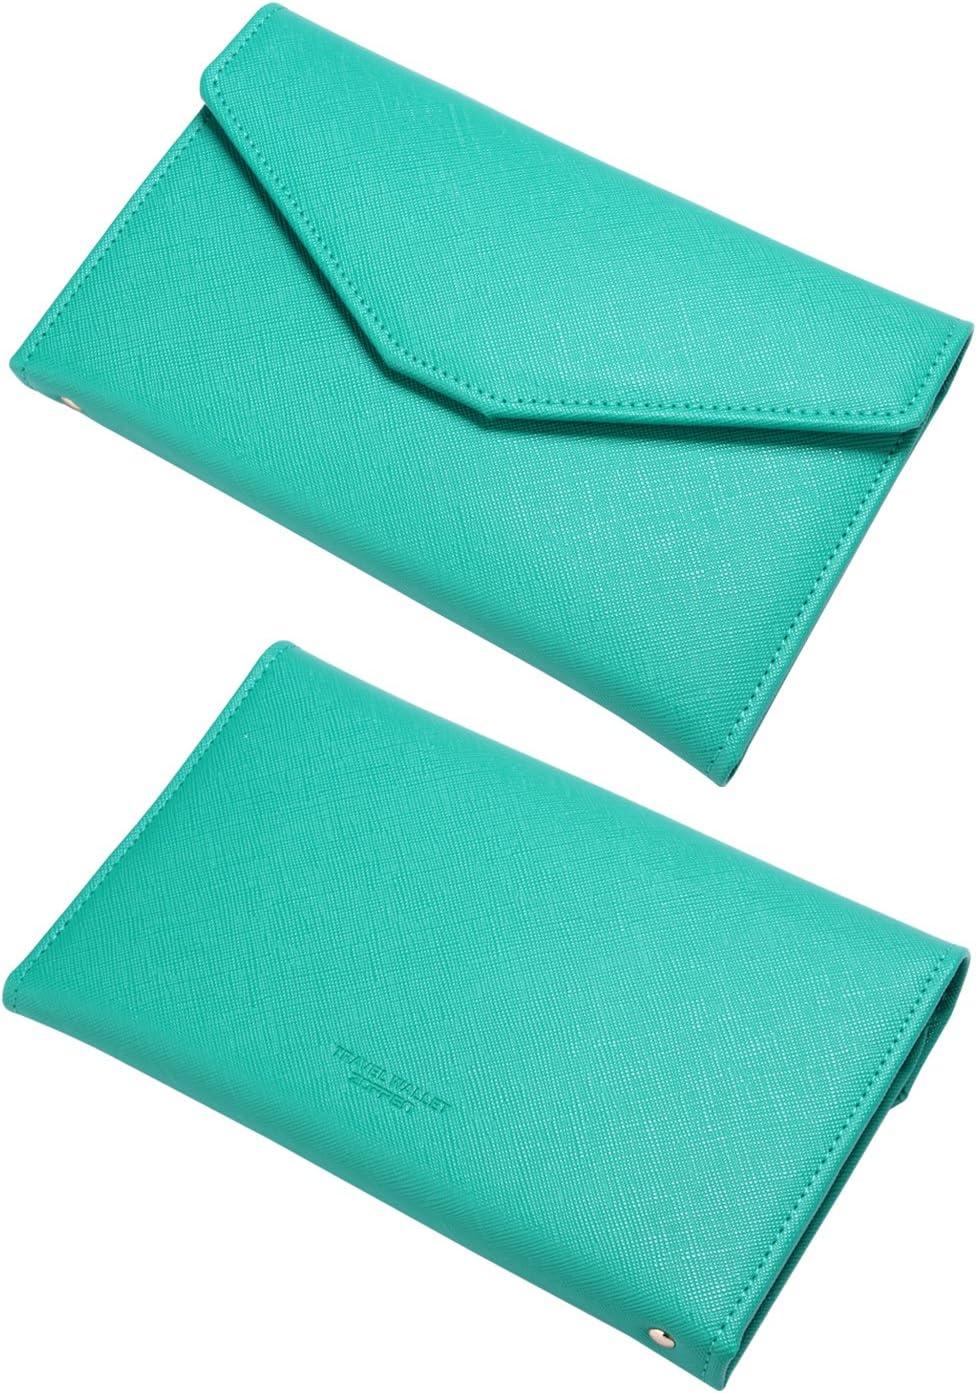 Zoppen Multi-purpose Rfid Blocking Travel Passport Wallet For Women Tri-fold Document Organizer Holder Ver.4